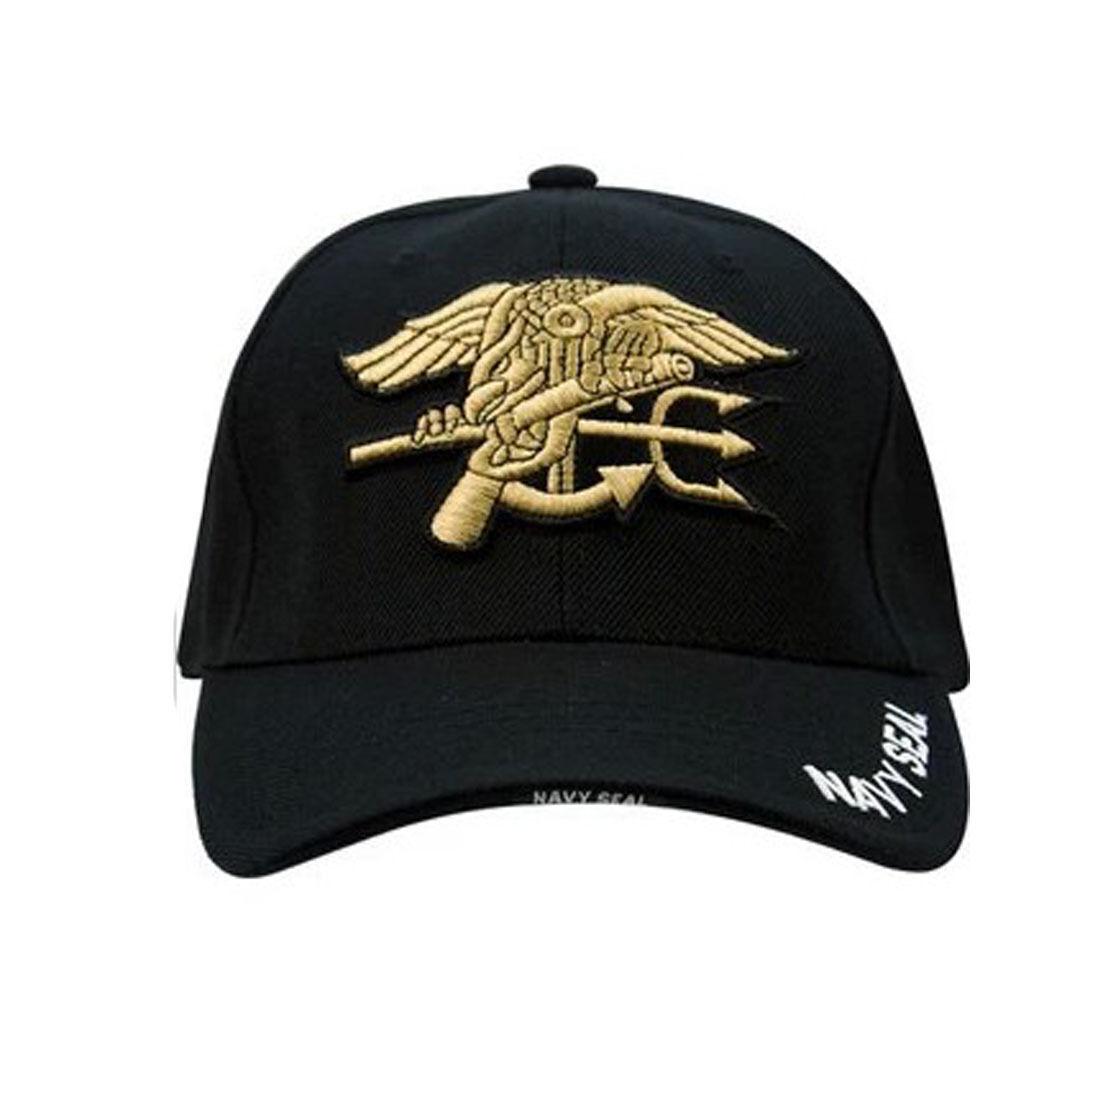 Outdoor Sports Black Tactical Military Hunting Hats Navy Seal Baseball Cap Hat